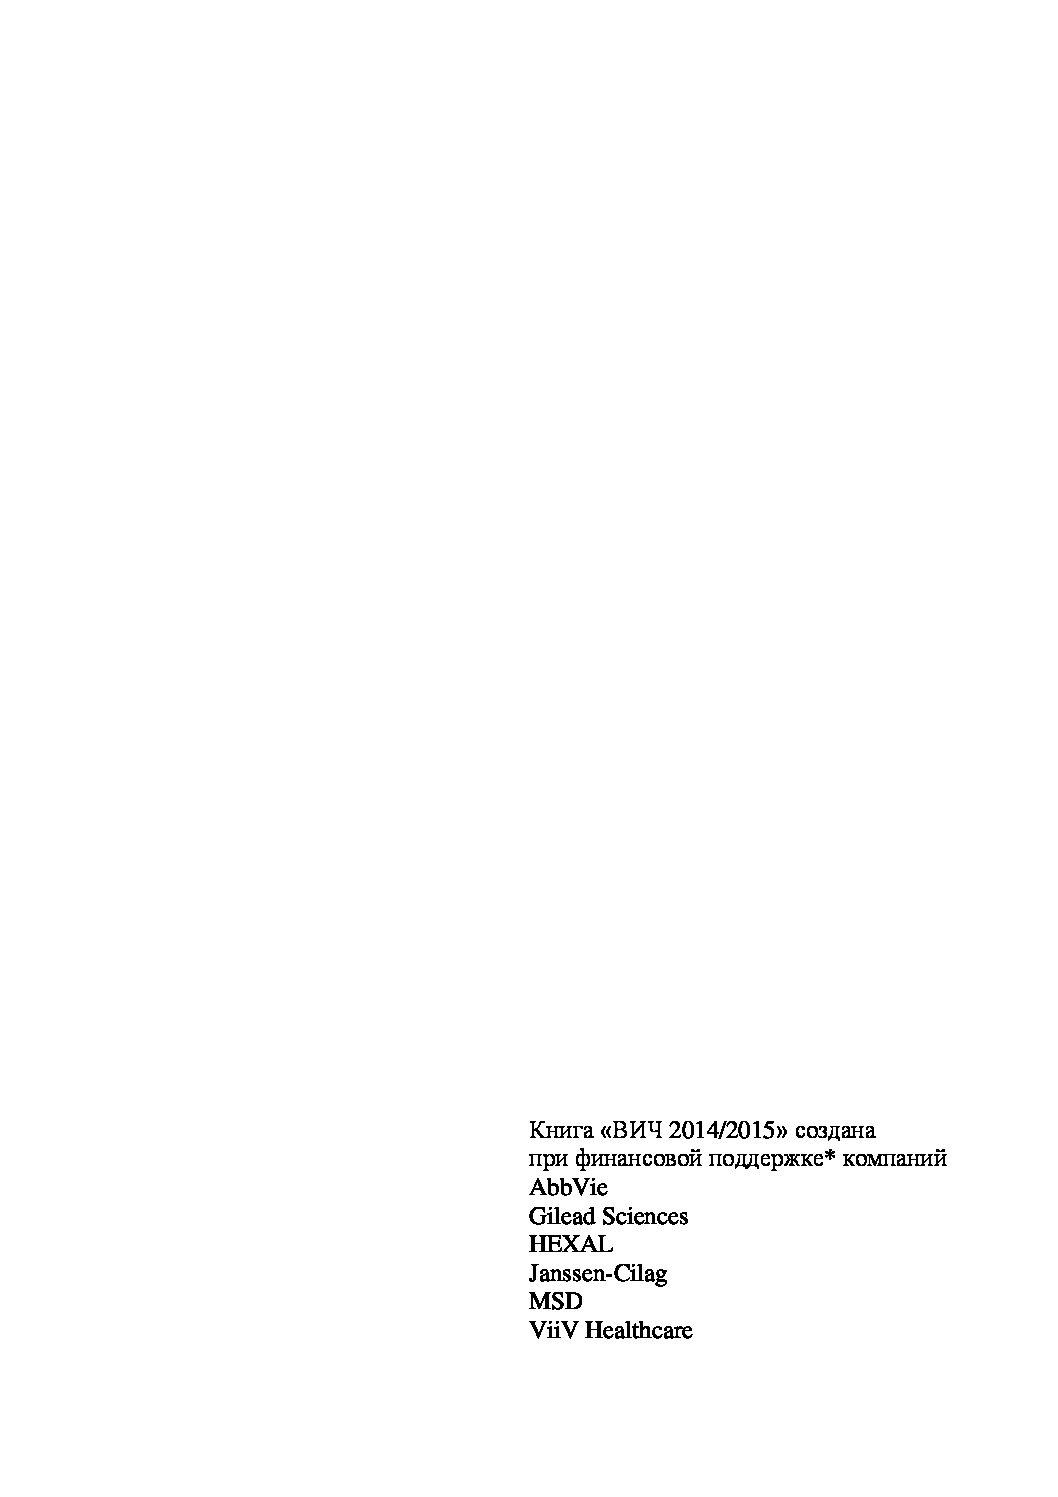 ВИЧ 2014/15 Под редакцией Кристиана Хоффмана и Юргена К. Рокштро